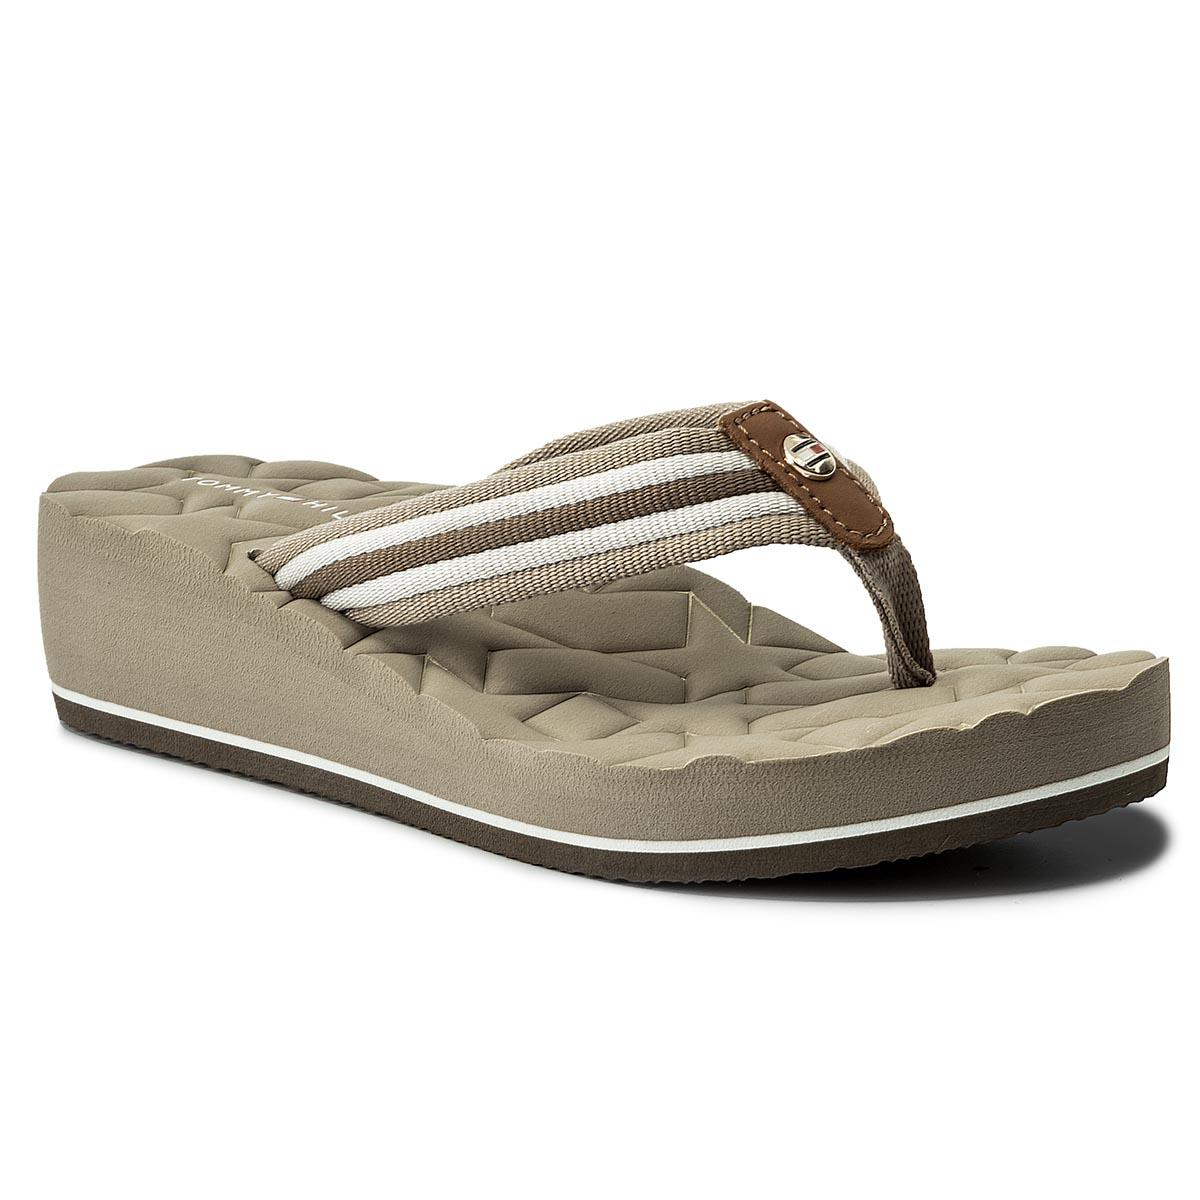 Žabky TOMMY HILFIGER - Comfort Mid Beach Sandal FW0FW02367 ... 9935a38d33